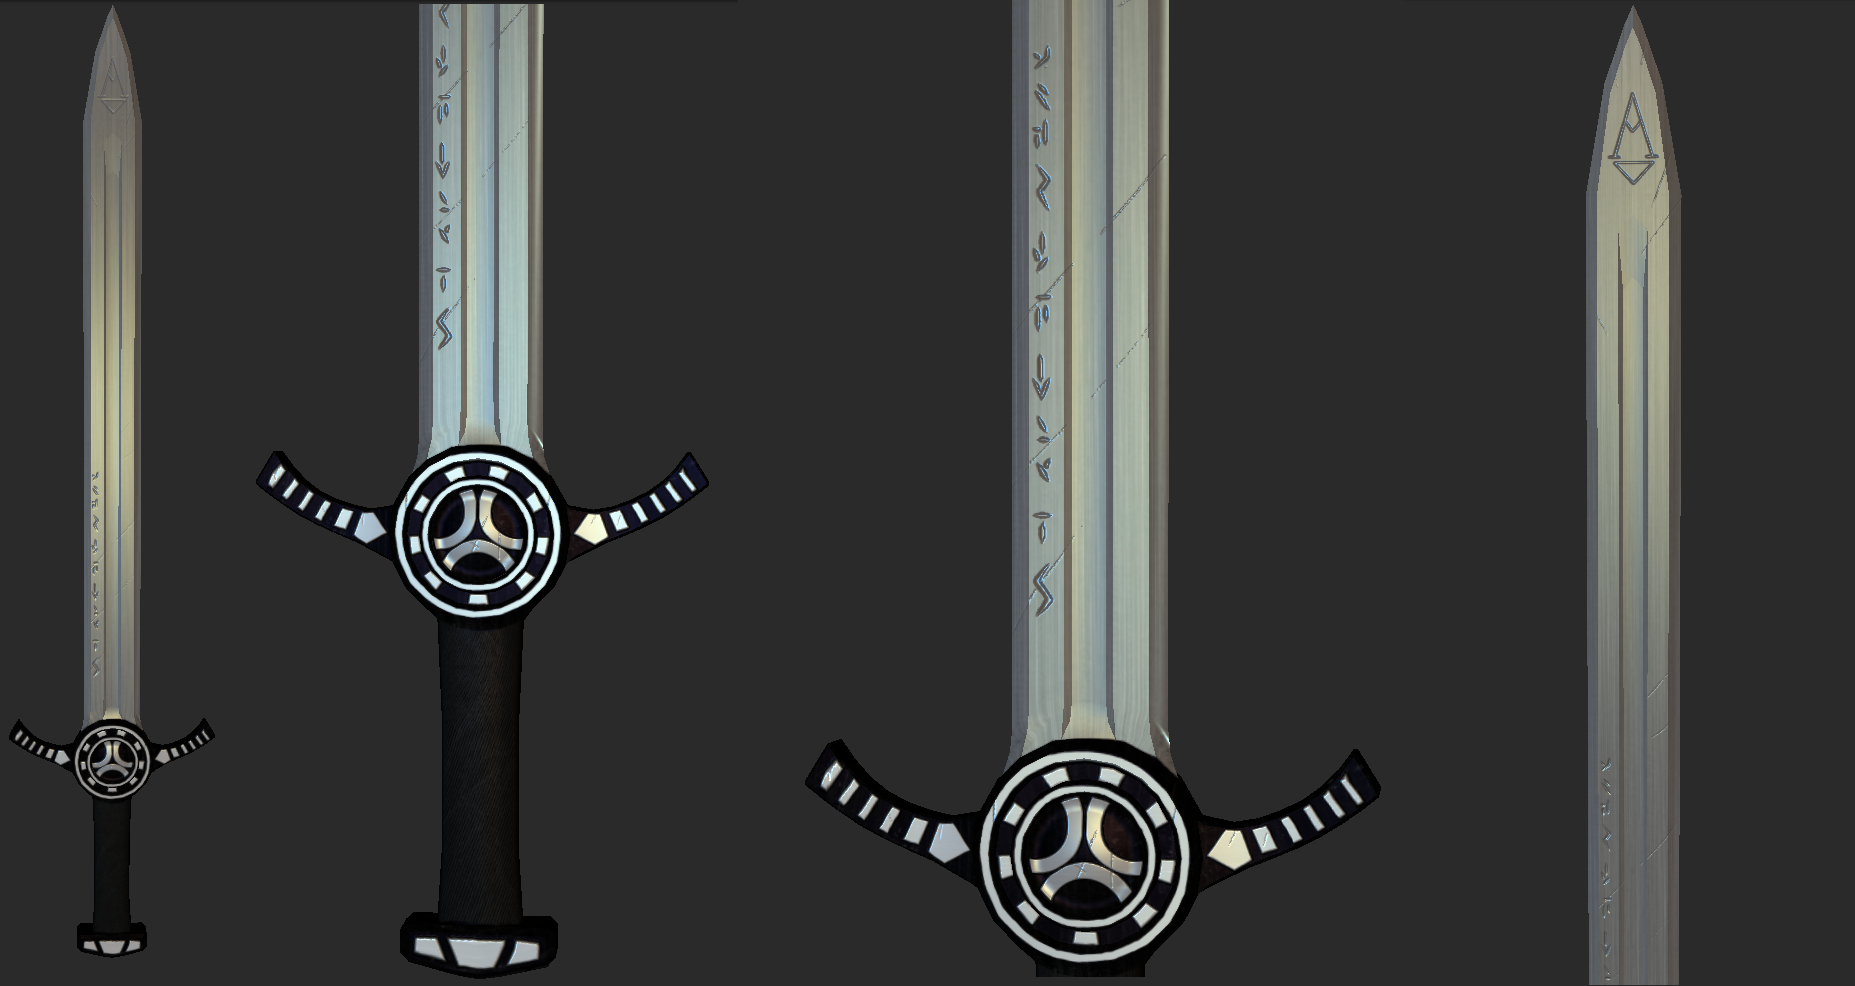 3D Sword Design by Alexander93 on DeviantArt: alexander93.deviantart.com/art/3D-Sword-Design-352905100